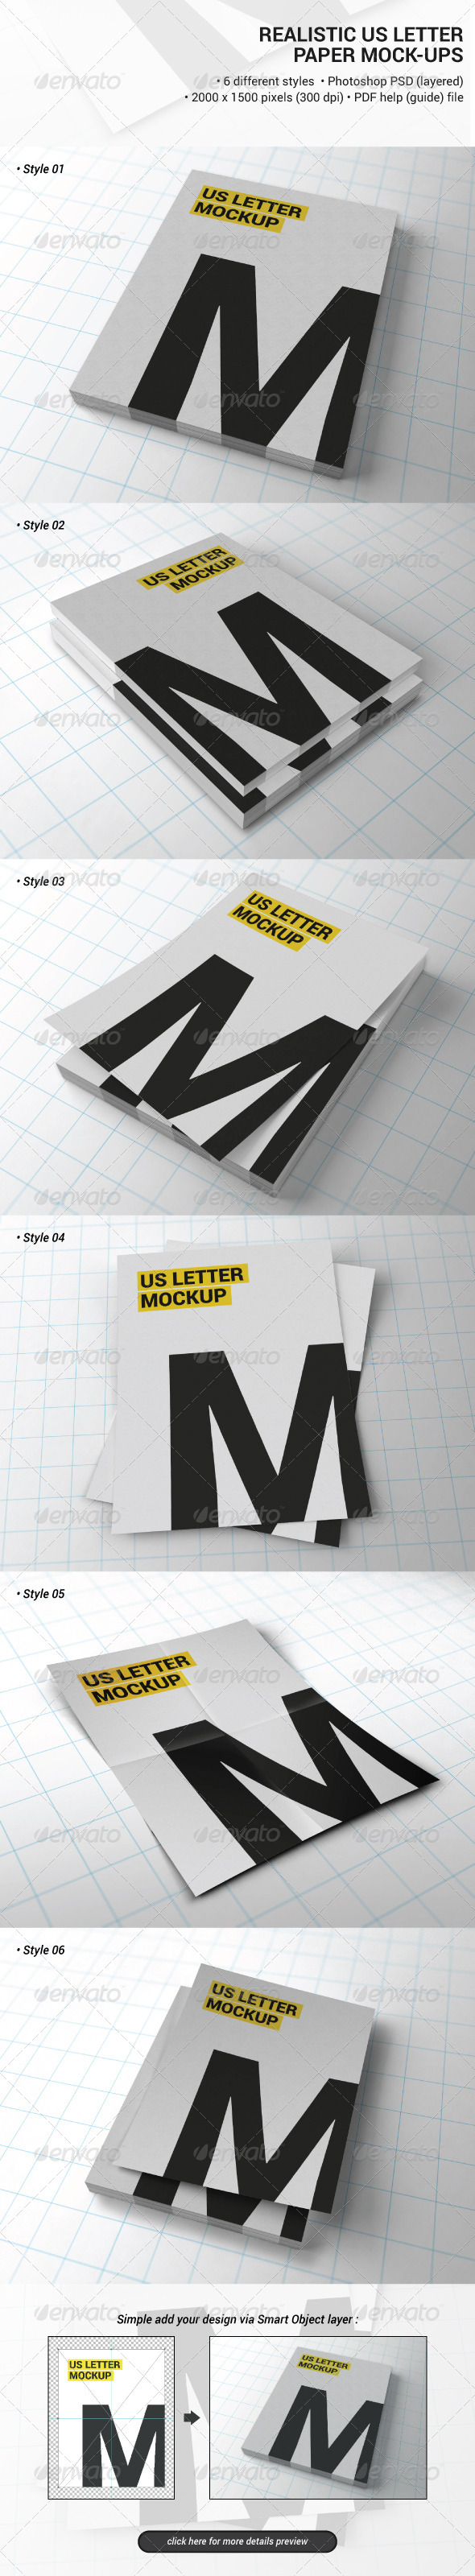 Realistic Us Letter Paper Mock-ups - Product Mock-Ups Graphics